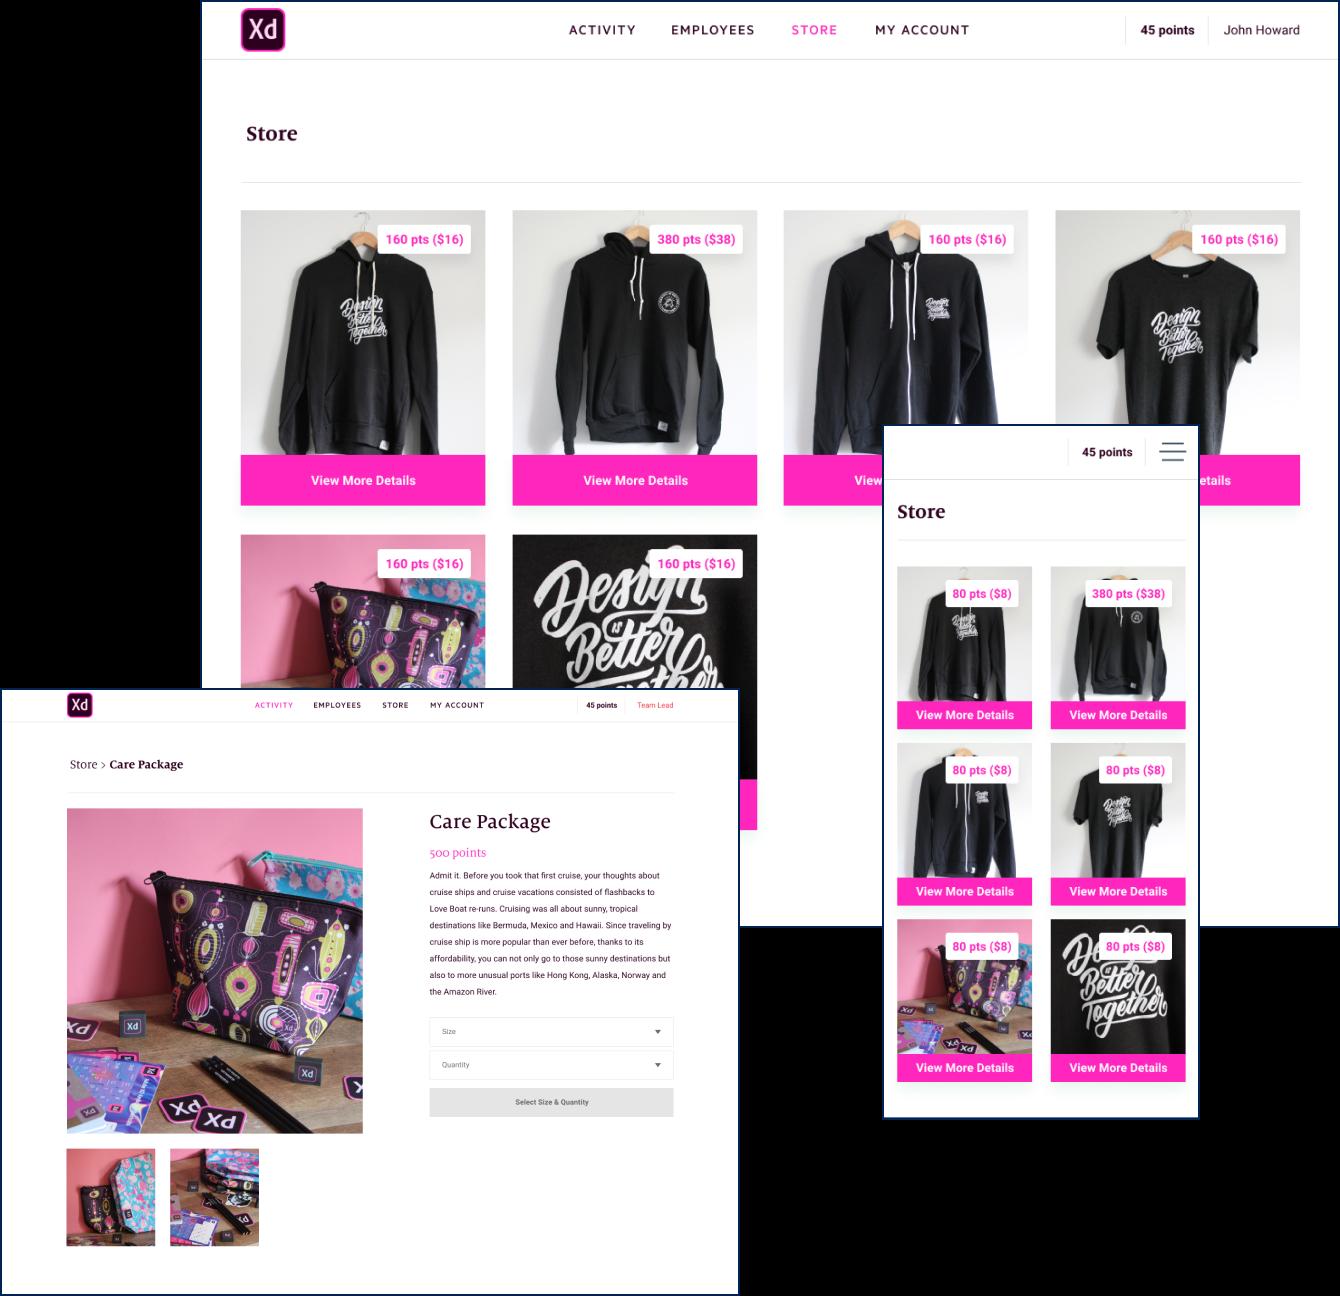 Screenshots of Adobe XD branded swag